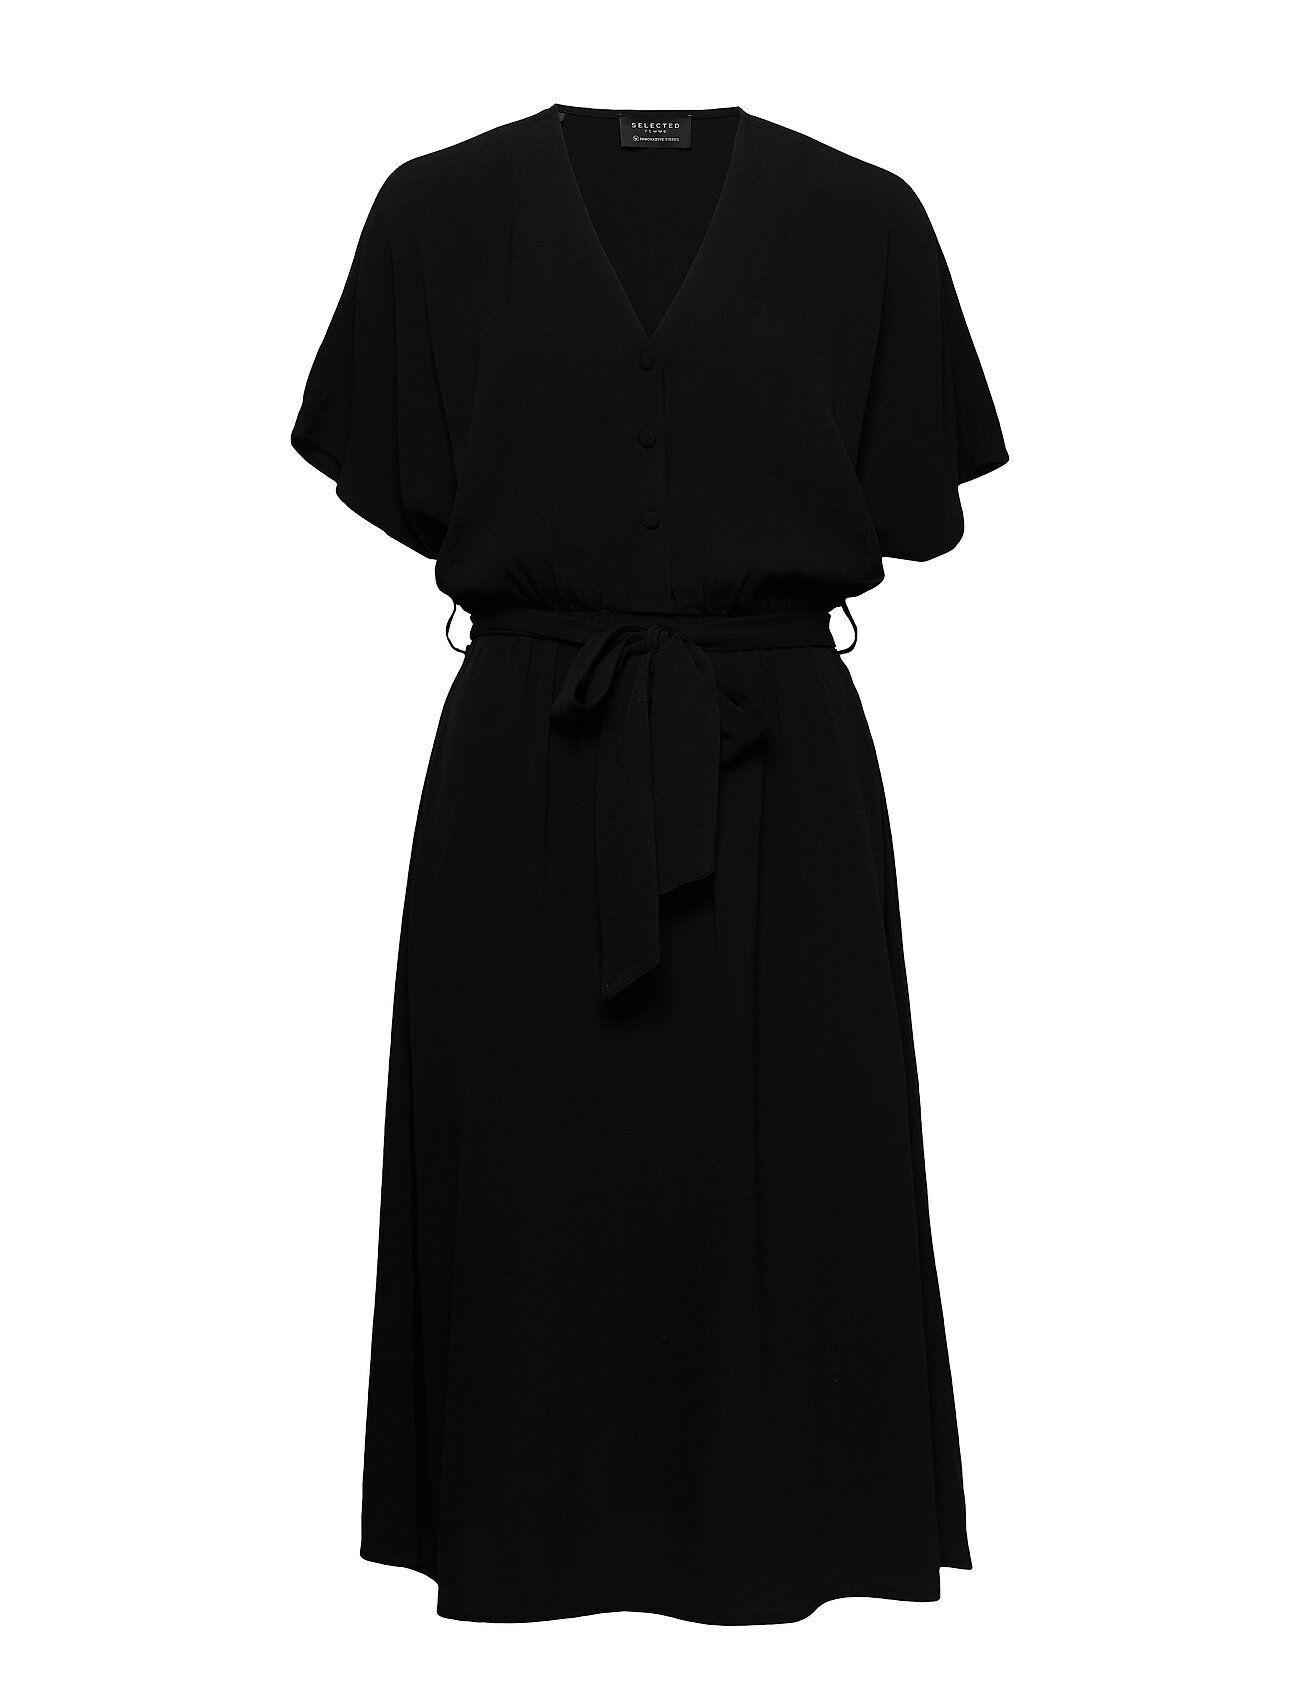 Selected Femme Slfvienna Ss Short Dress B Noos Polvipituinen Mekko Musta Selected Femme